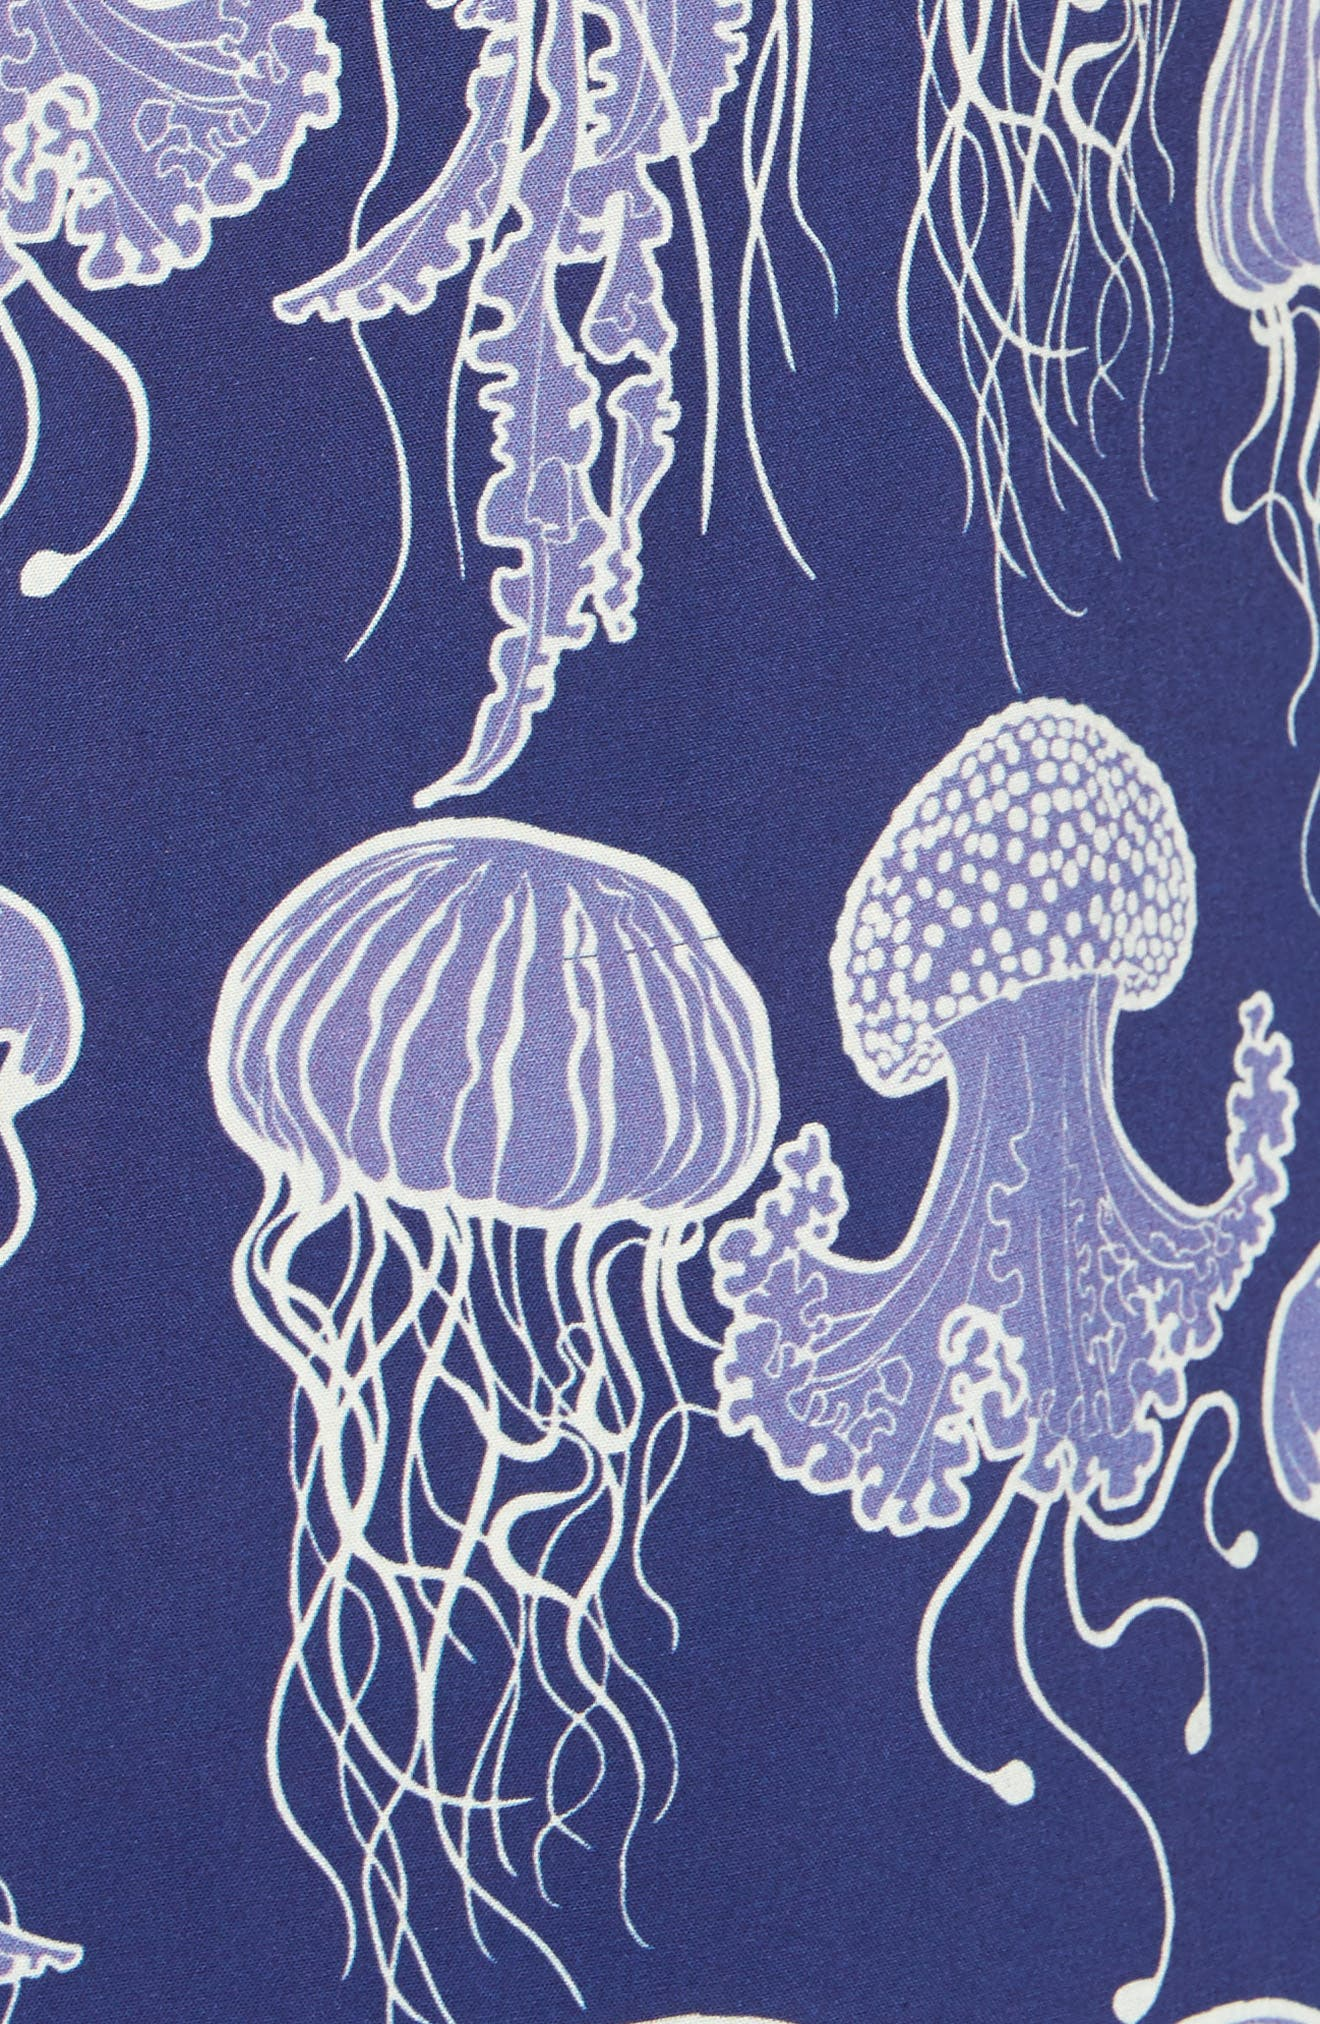 Jellyfish Print Camp Shirt,                             Alternate thumbnail 5, color,                             Grape